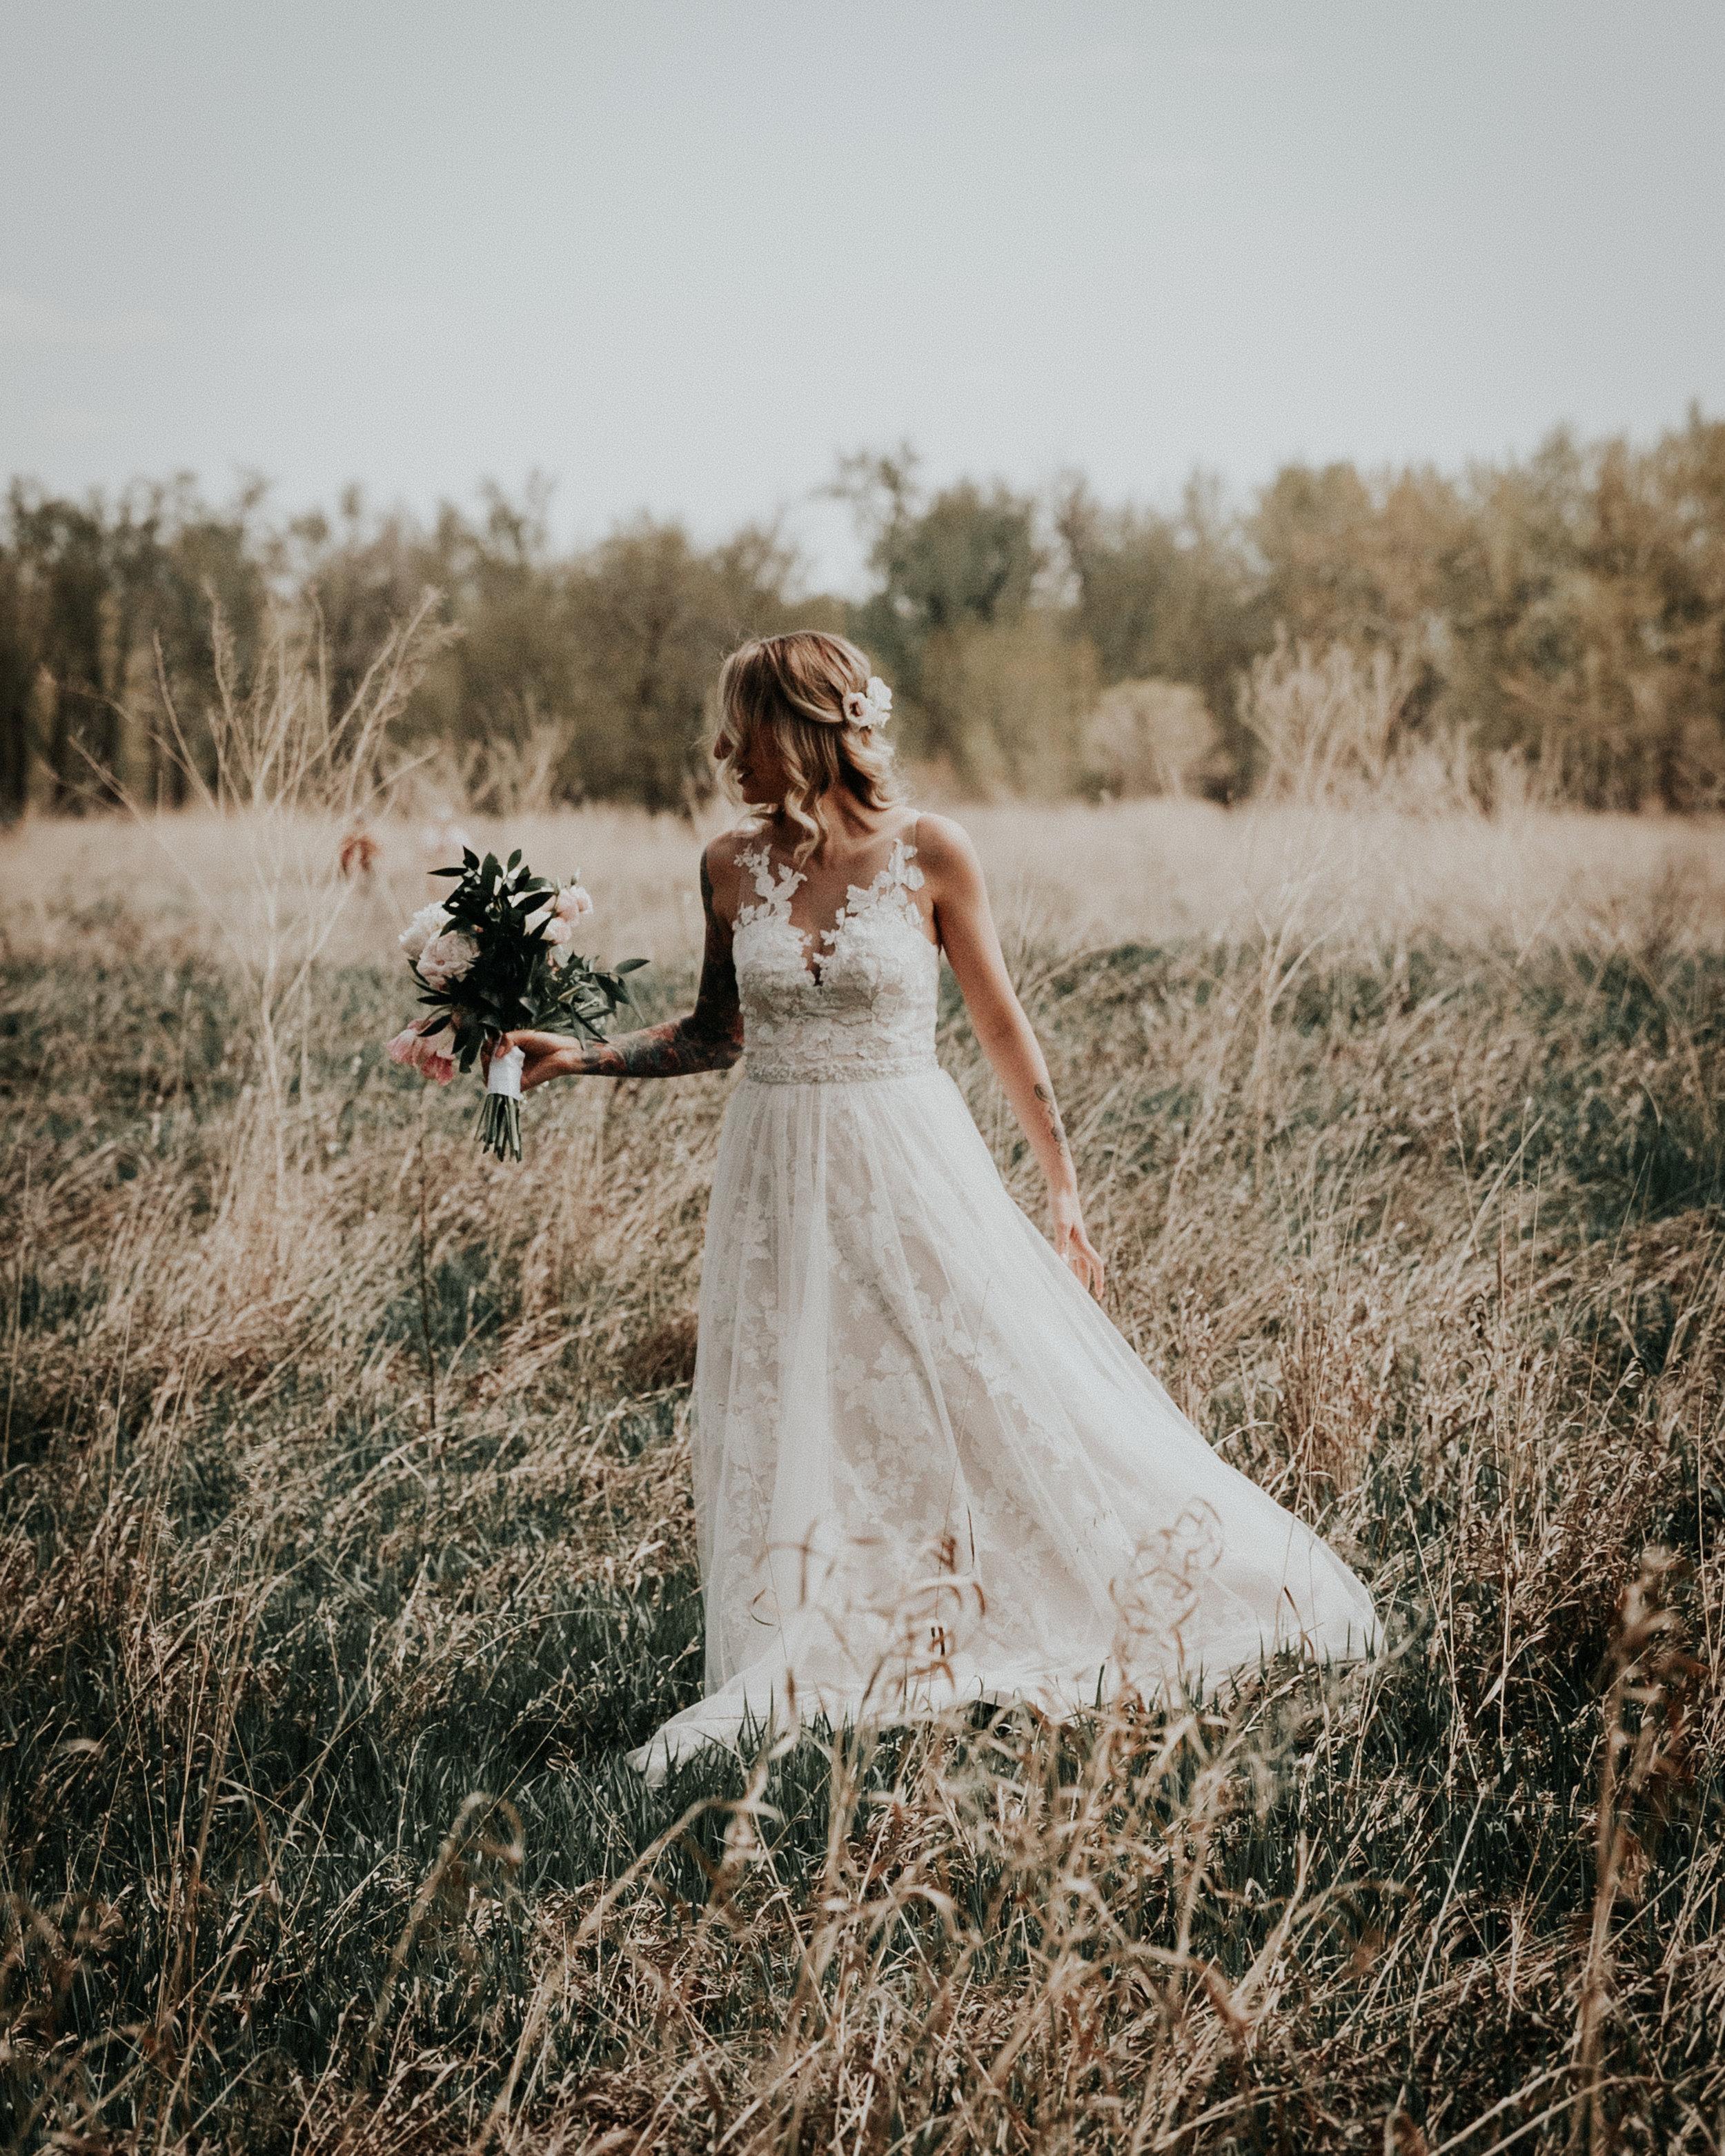 Walters Wedding Favourites - JayRMcDonald (4 of 18).JPG